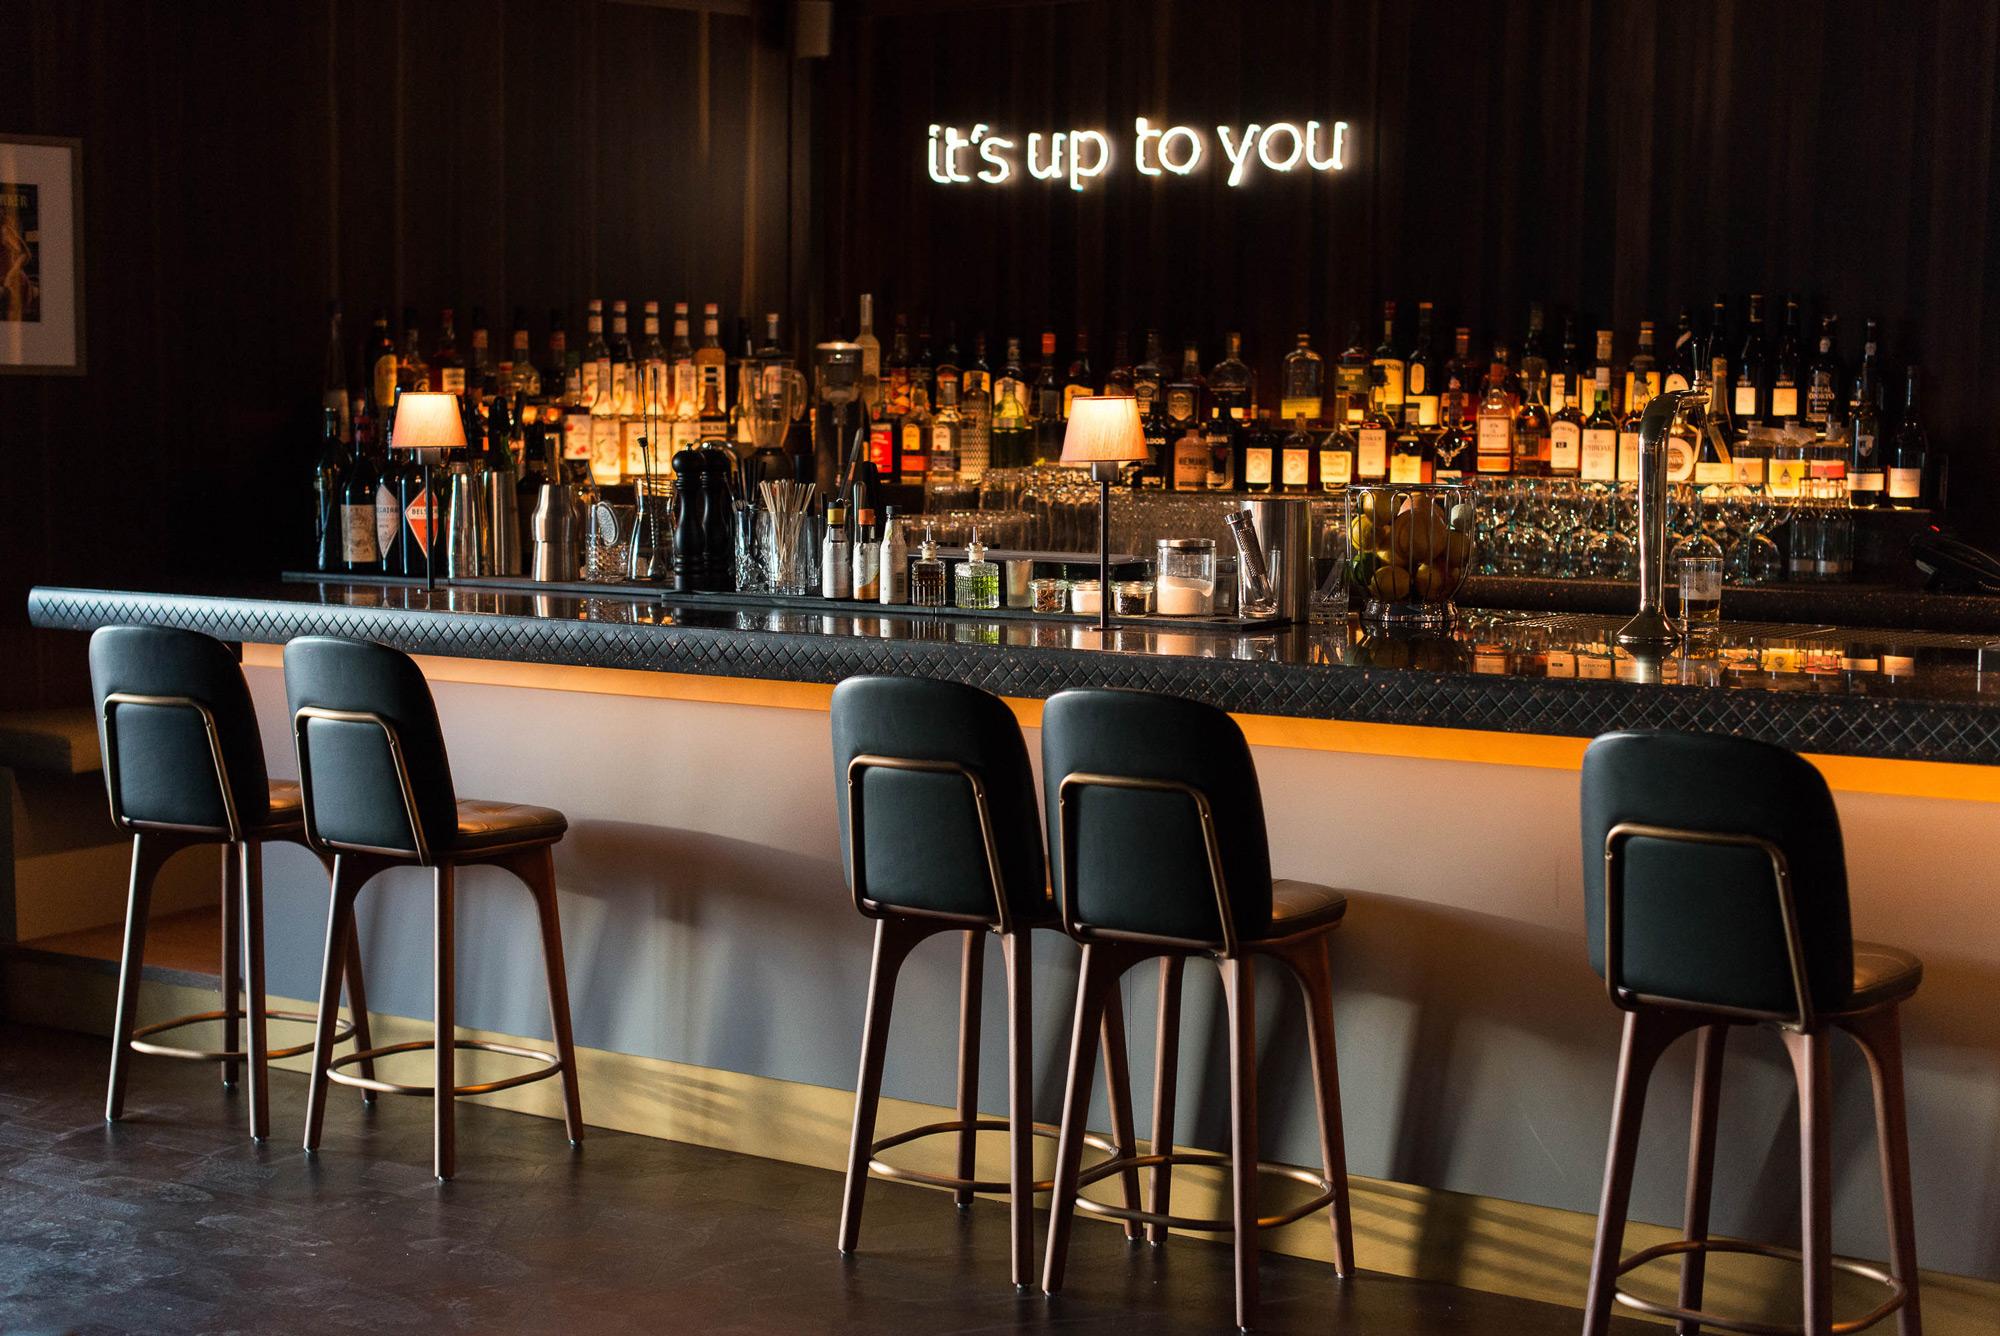 New York Bar (c) The Liberty